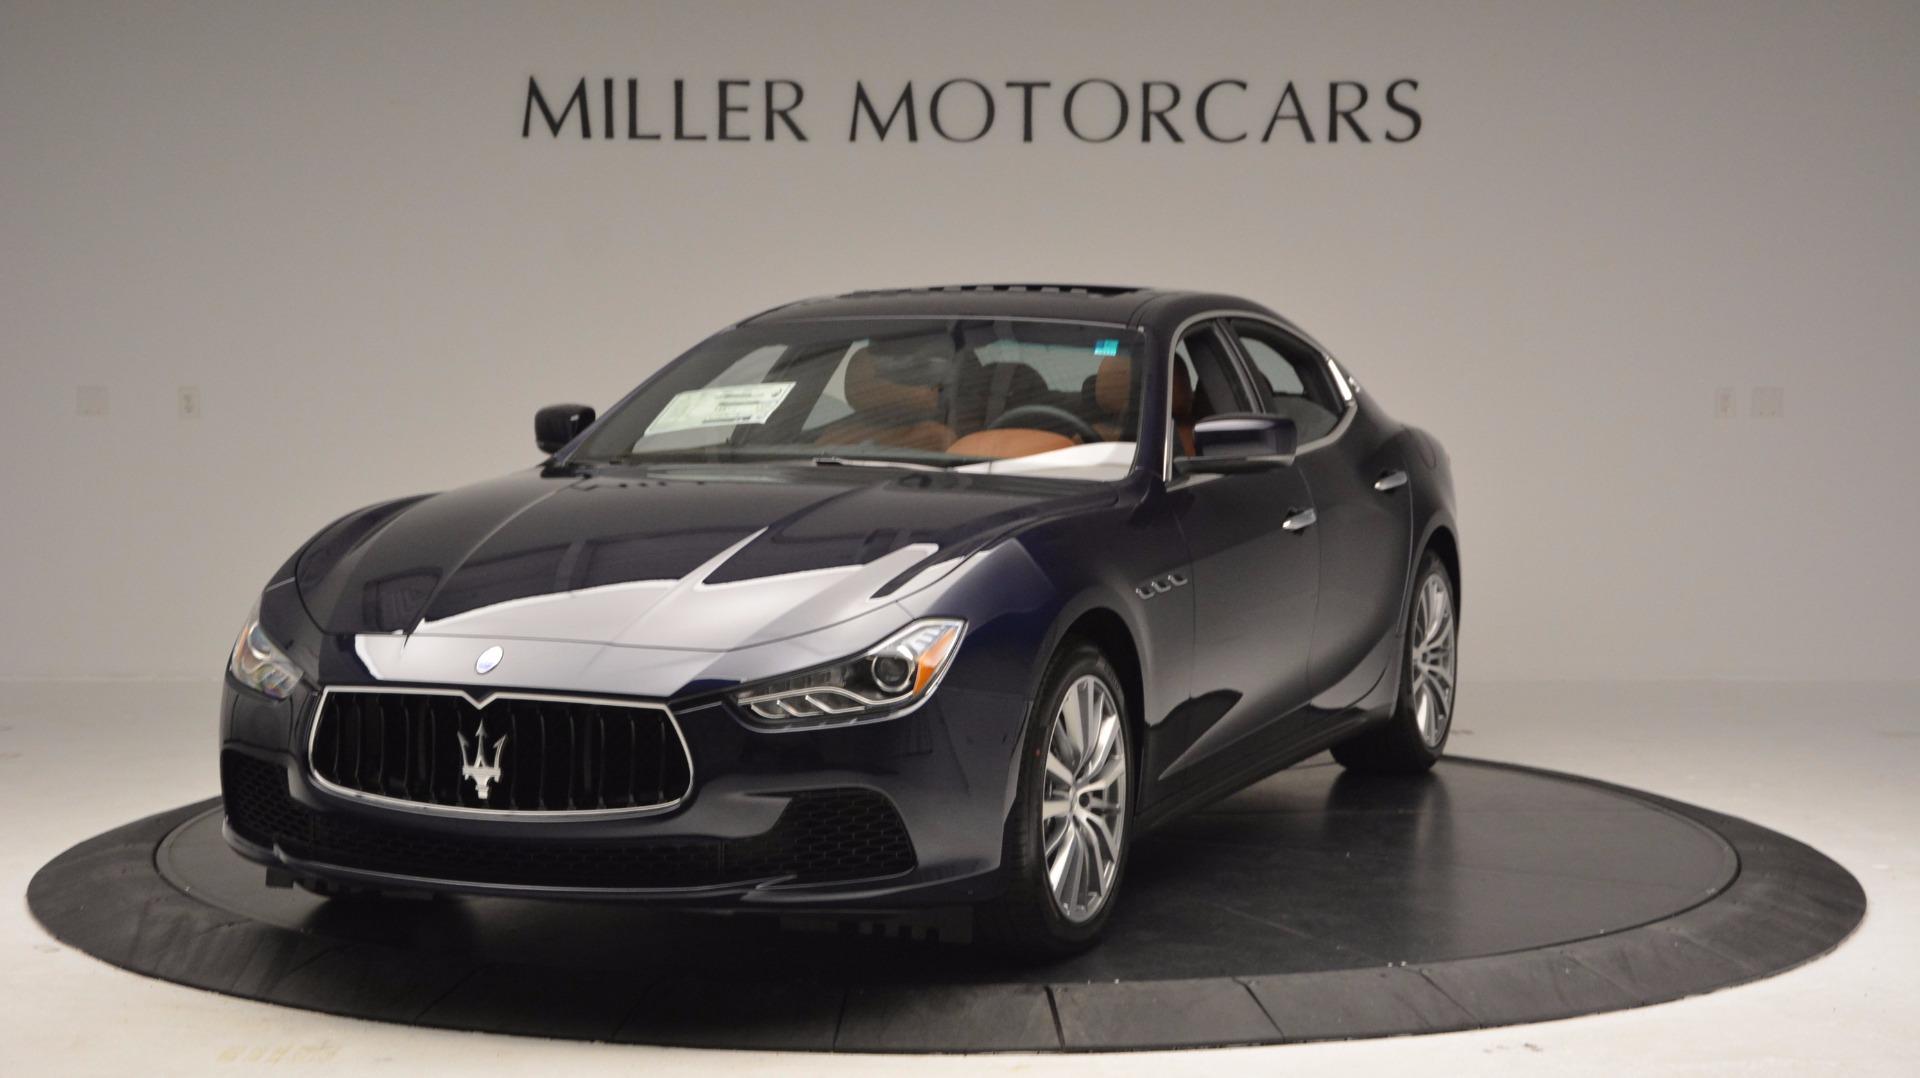 New 2017 Maserati Ghibli S Q4 For Sale In Greenwich, CT 1110_main